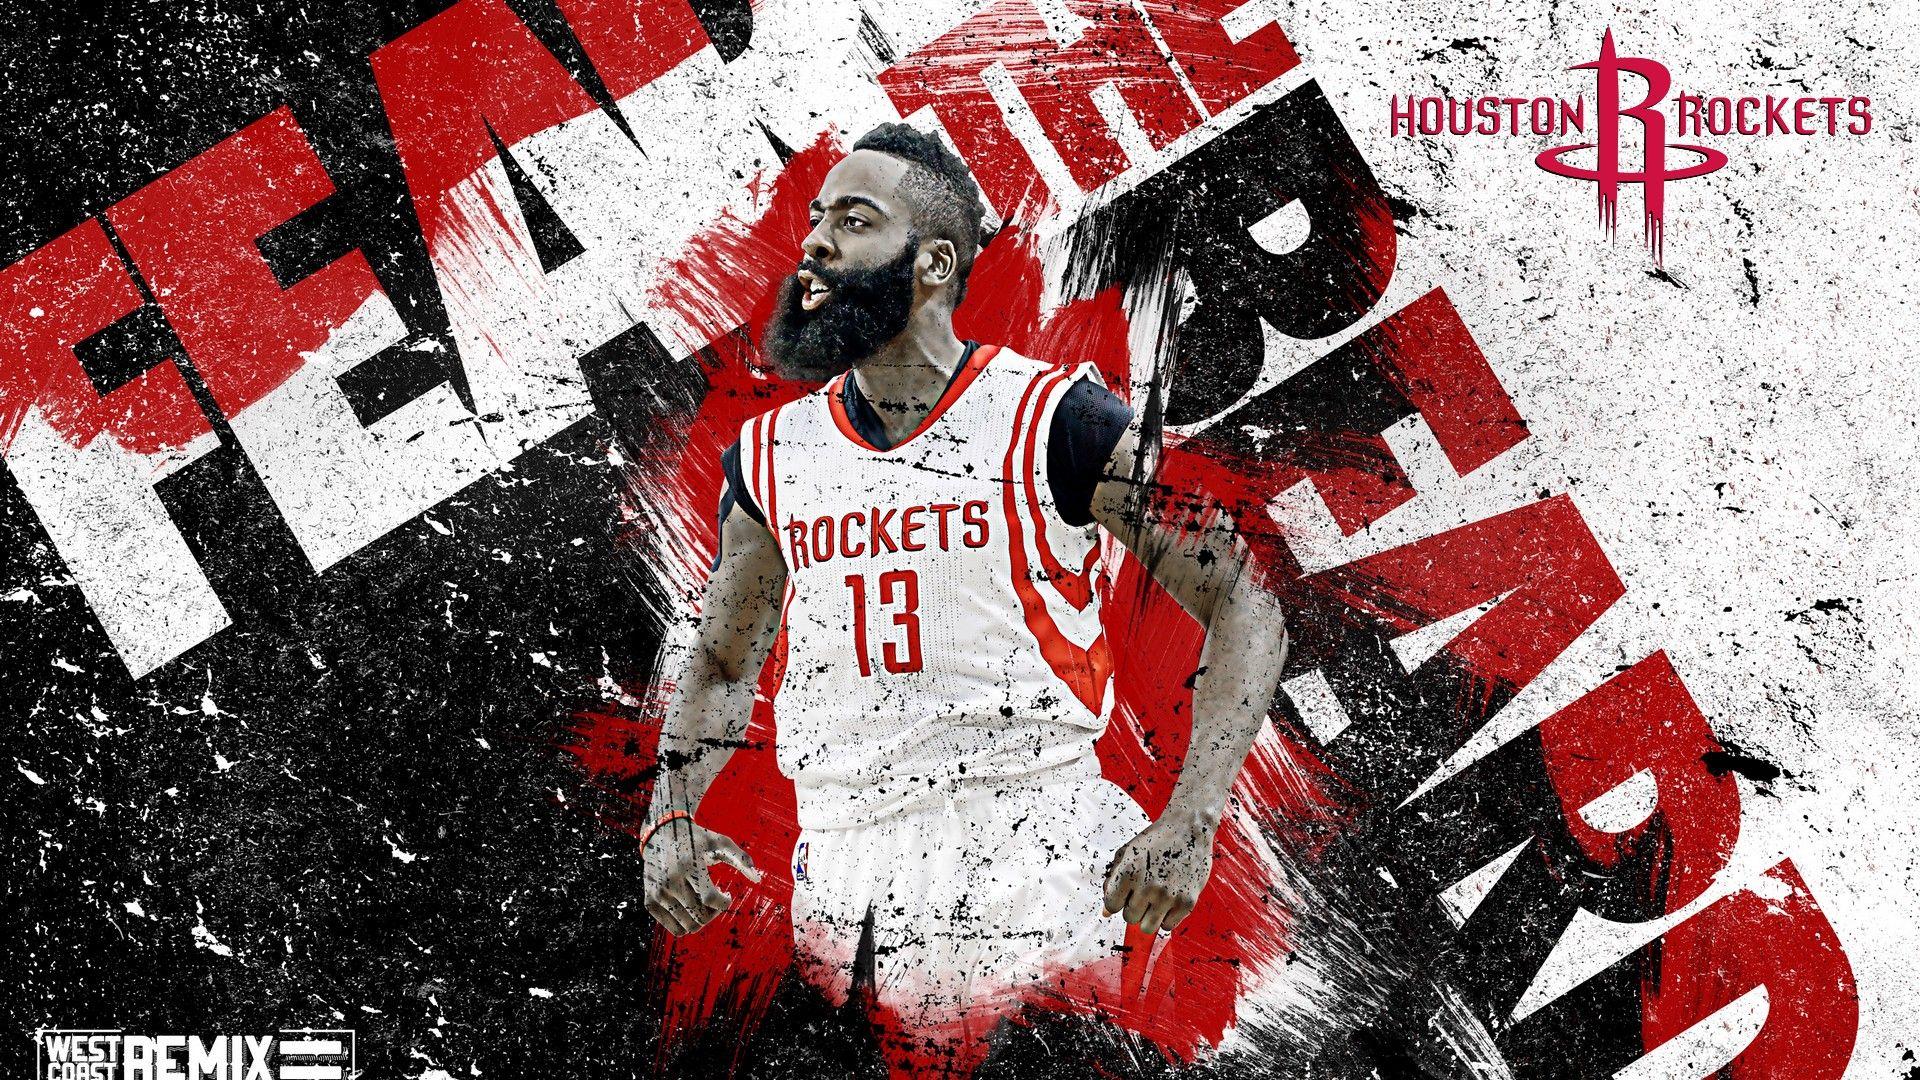 James Harden Beard Wallpaper For Mac Backgrounds 2020 Basketball Wallpaper Beard Wallpaper James Harden Houston Rockets